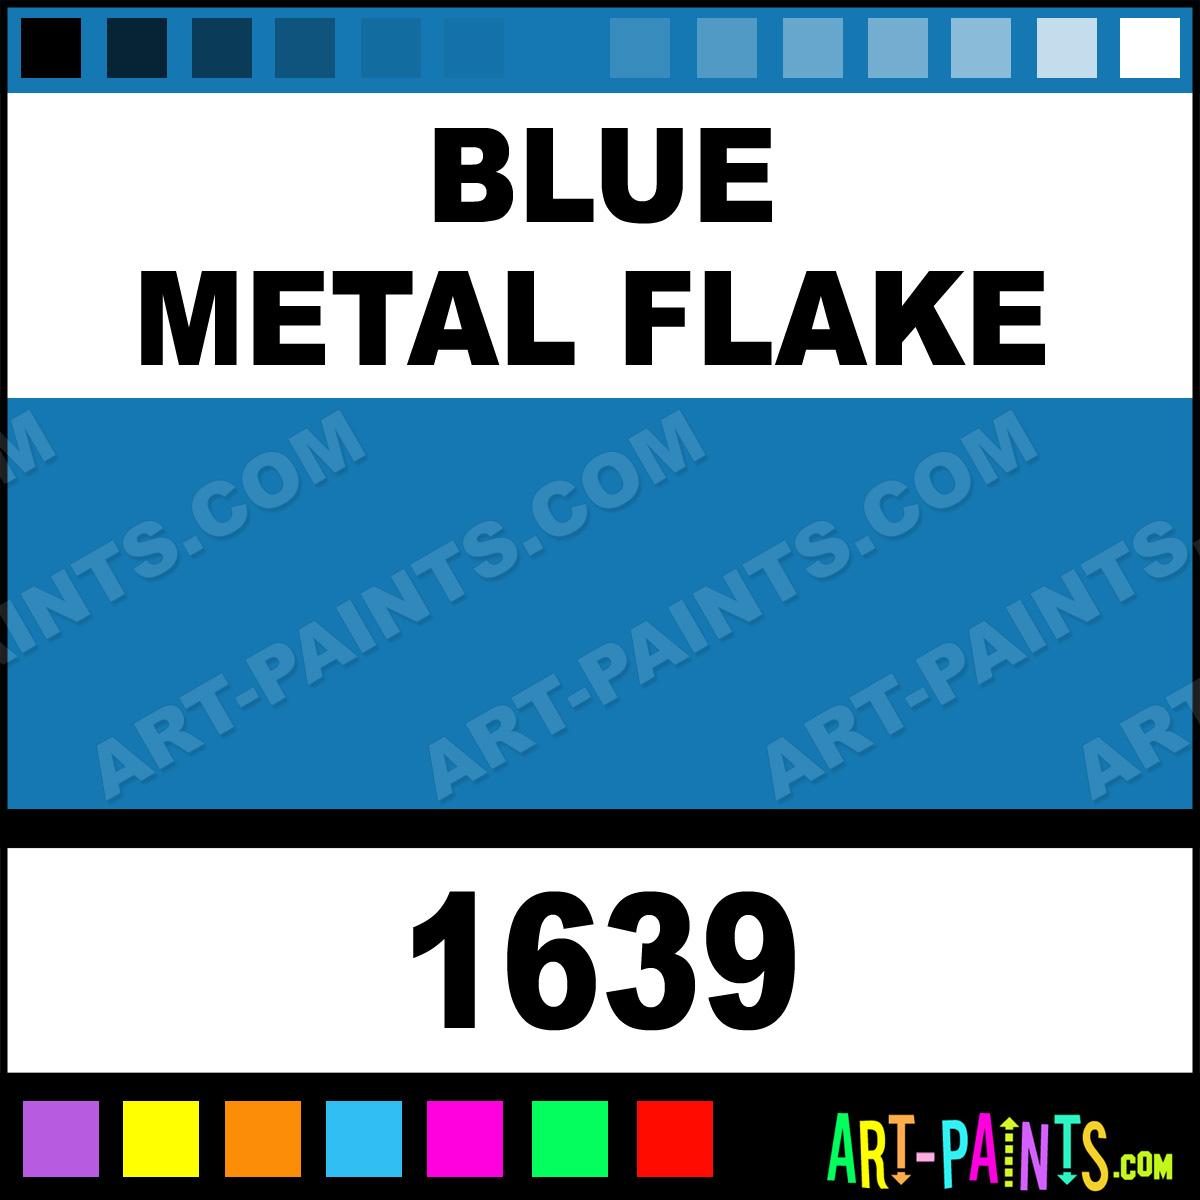 blue metal flake enamel spray paints aerosol decorative. Black Bedroom Furniture Sets. Home Design Ideas